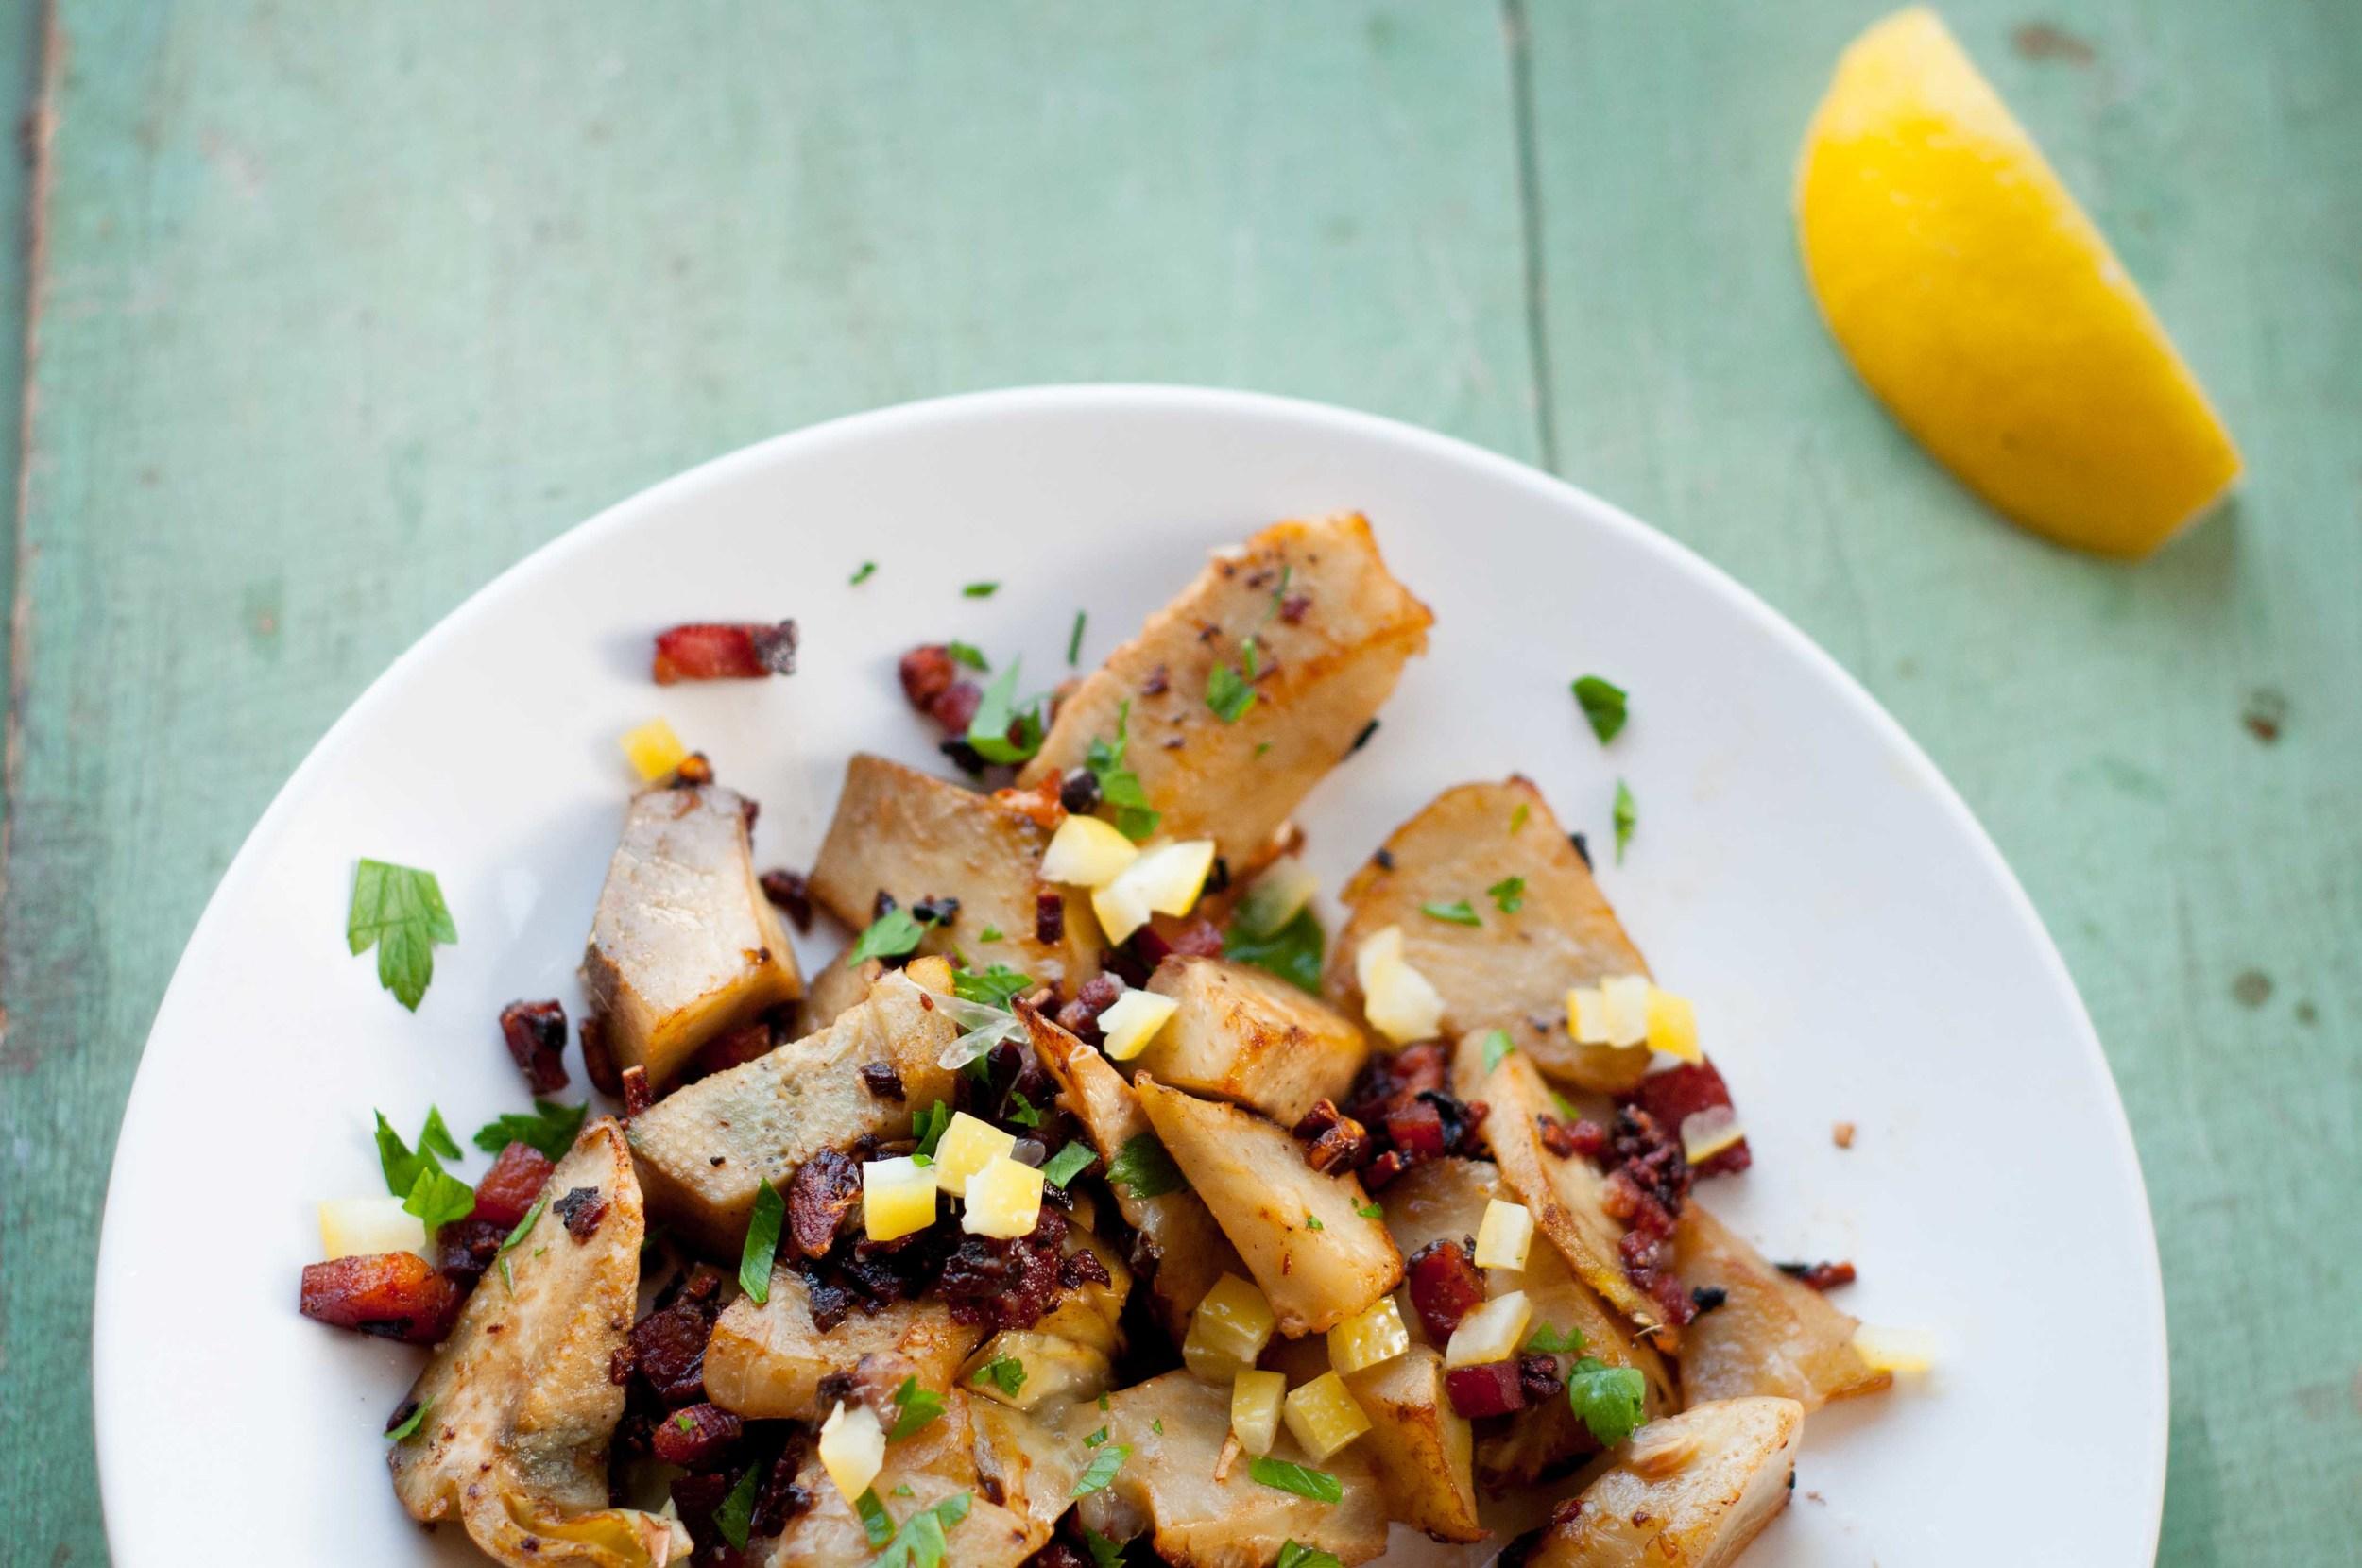 Pancetta sautéed artichoke hearts salad with diced boiled lemon.